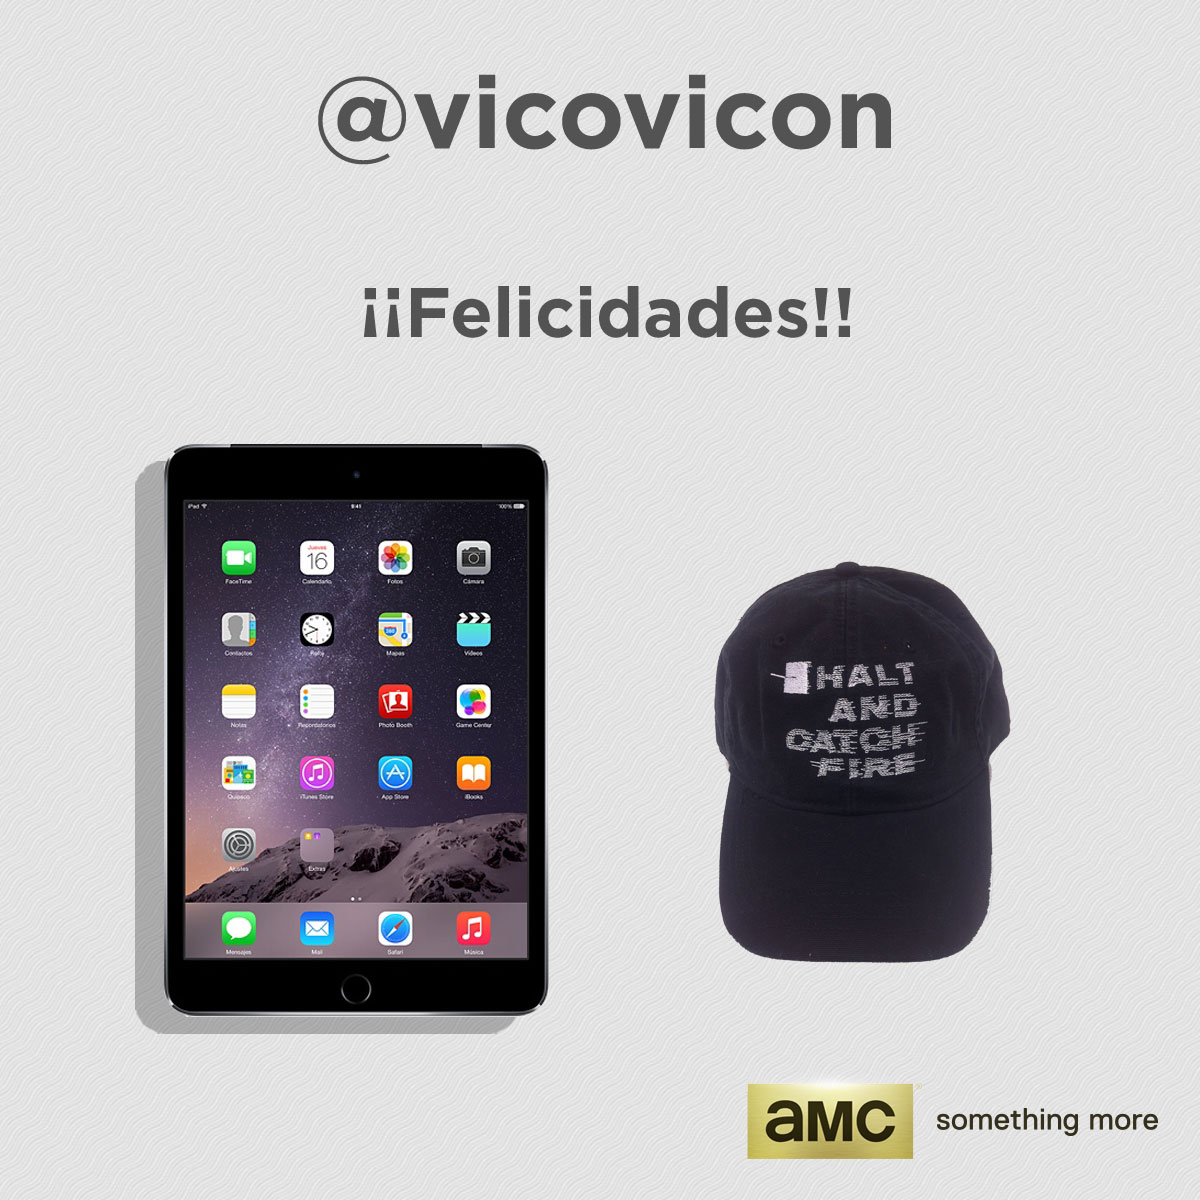 @viconvicon